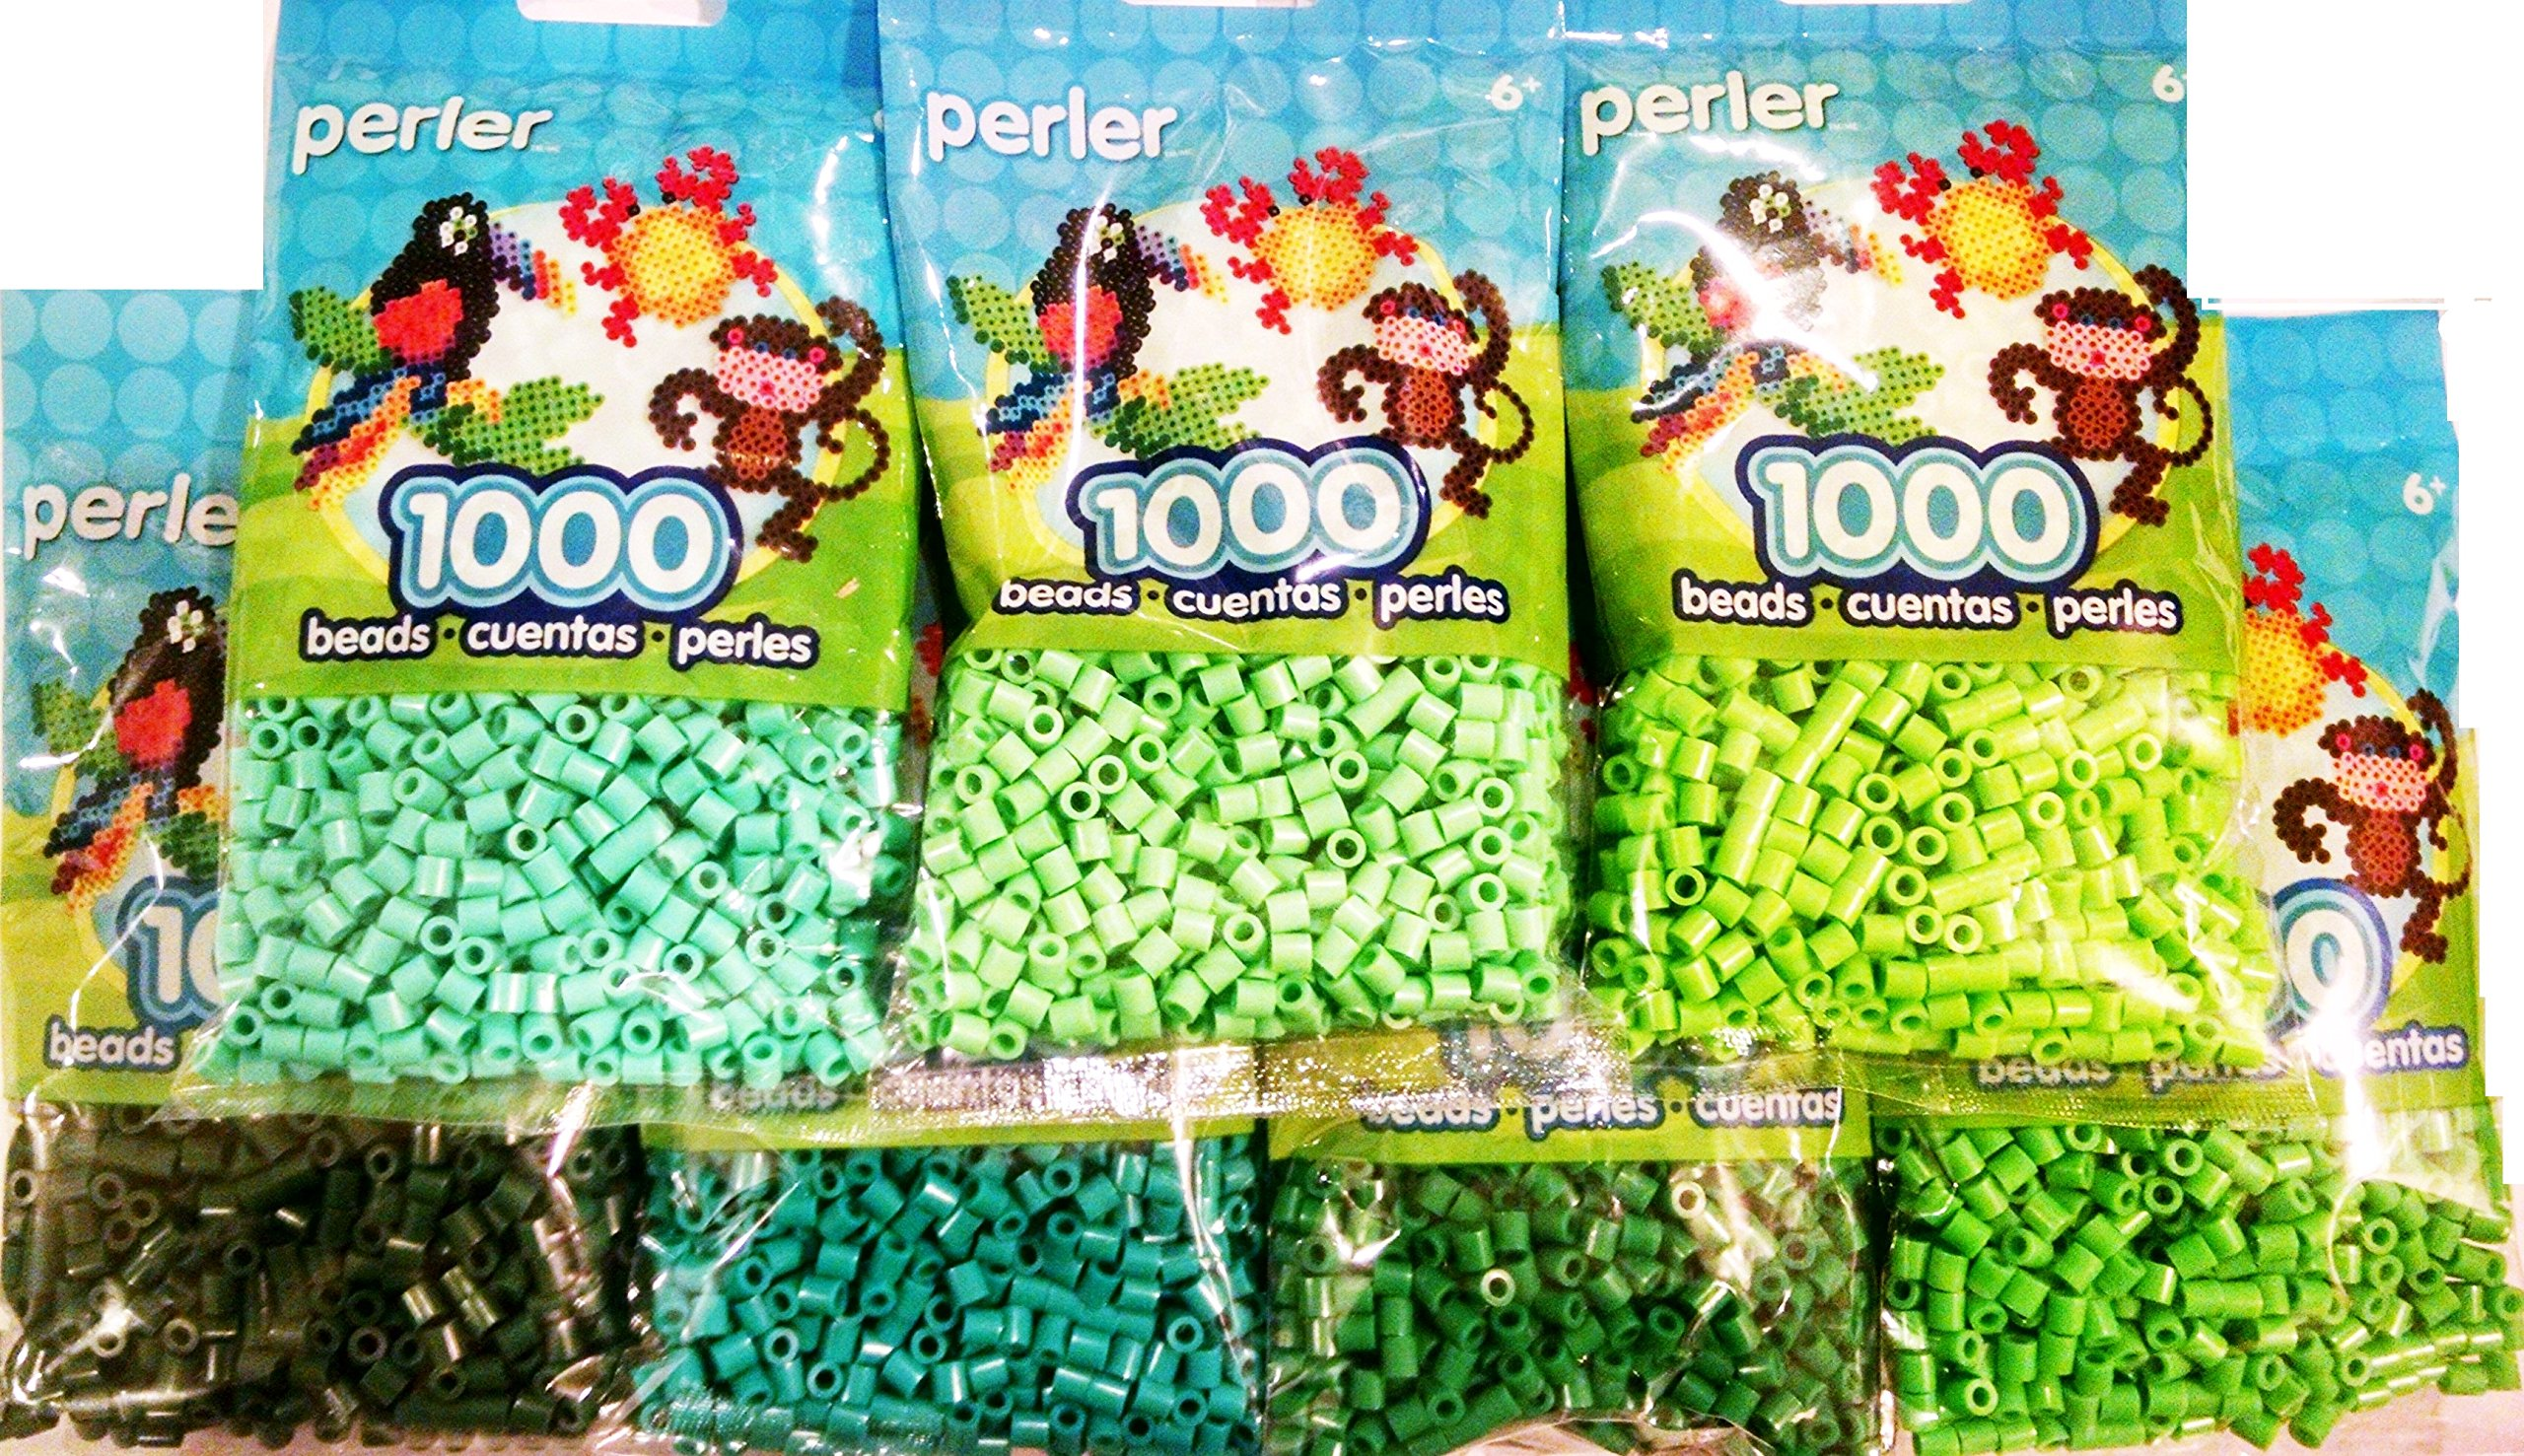 Perler Bead Bag, Green Group (Dark, Light, Pastel, Bright, Parrot Green, Evergreen, Kiwi Lime)